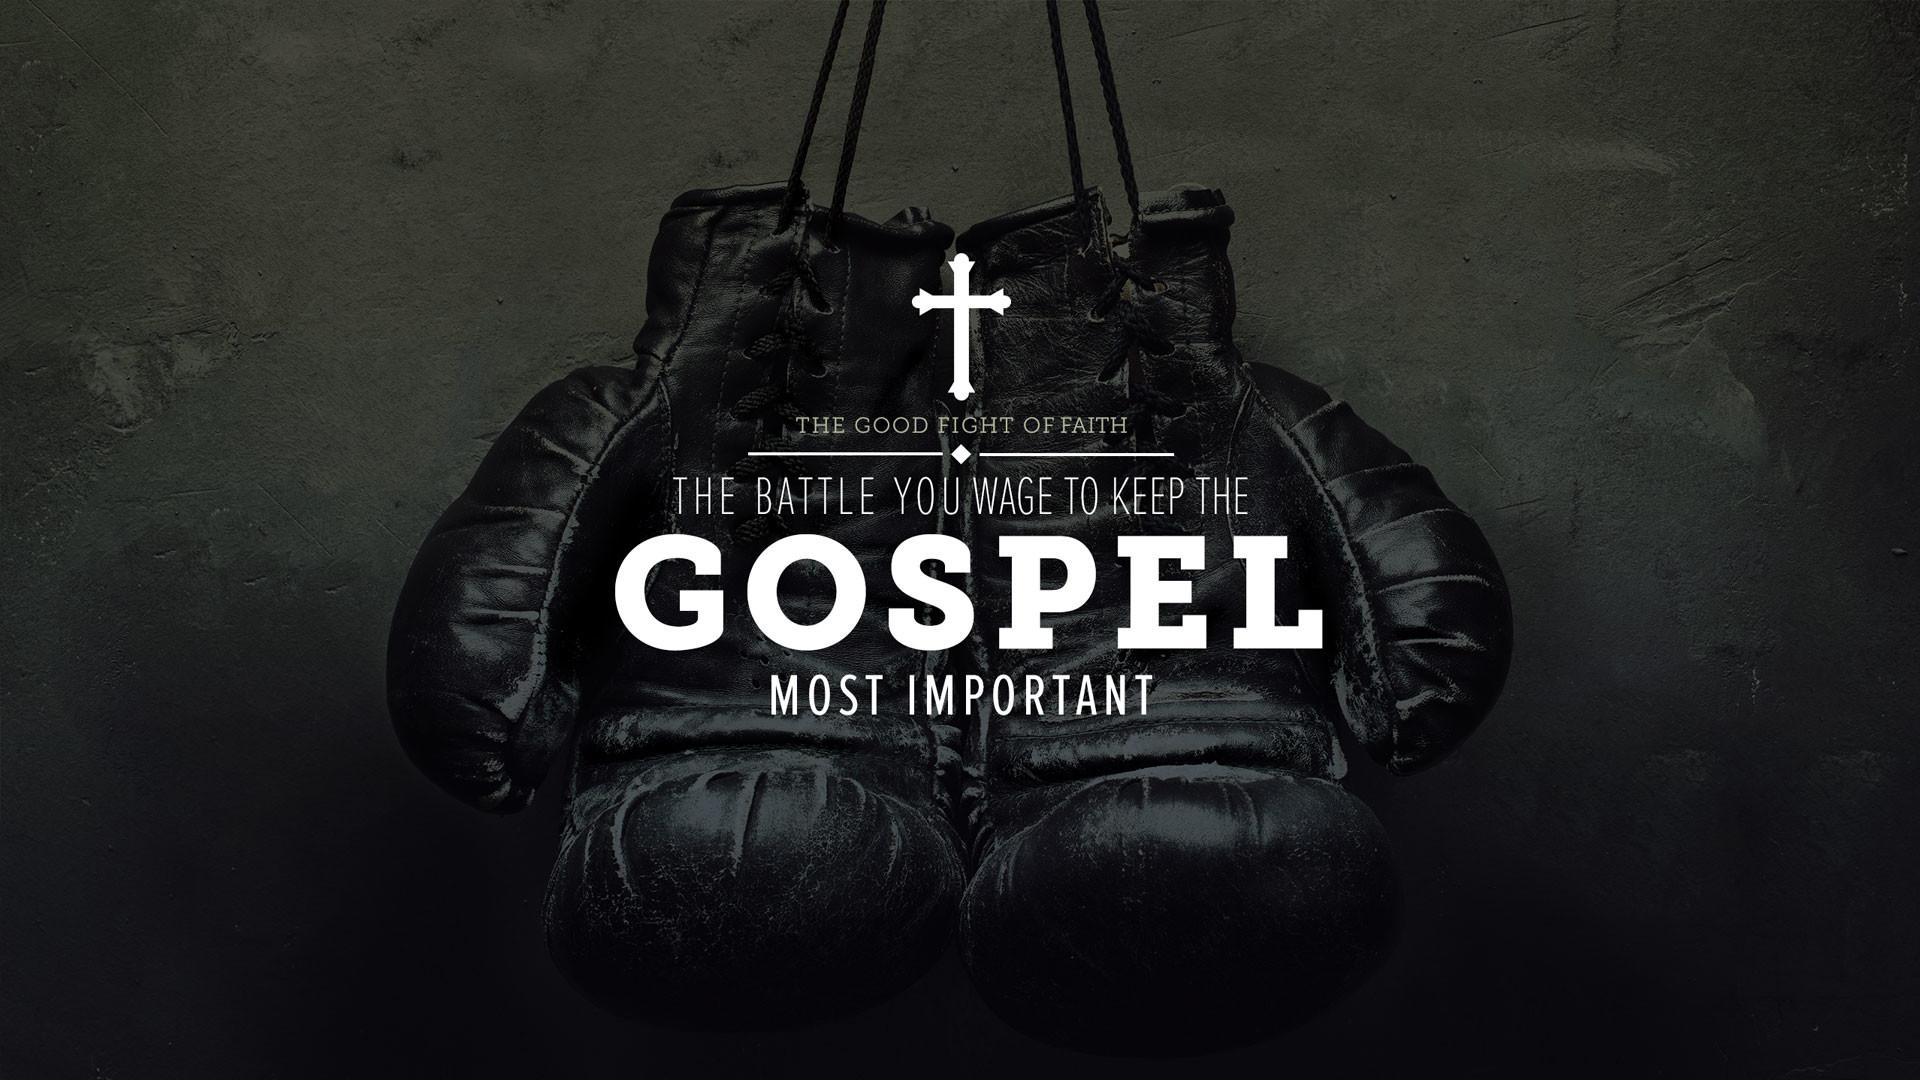 gospel music wallpaper 1280x800 - photo #31